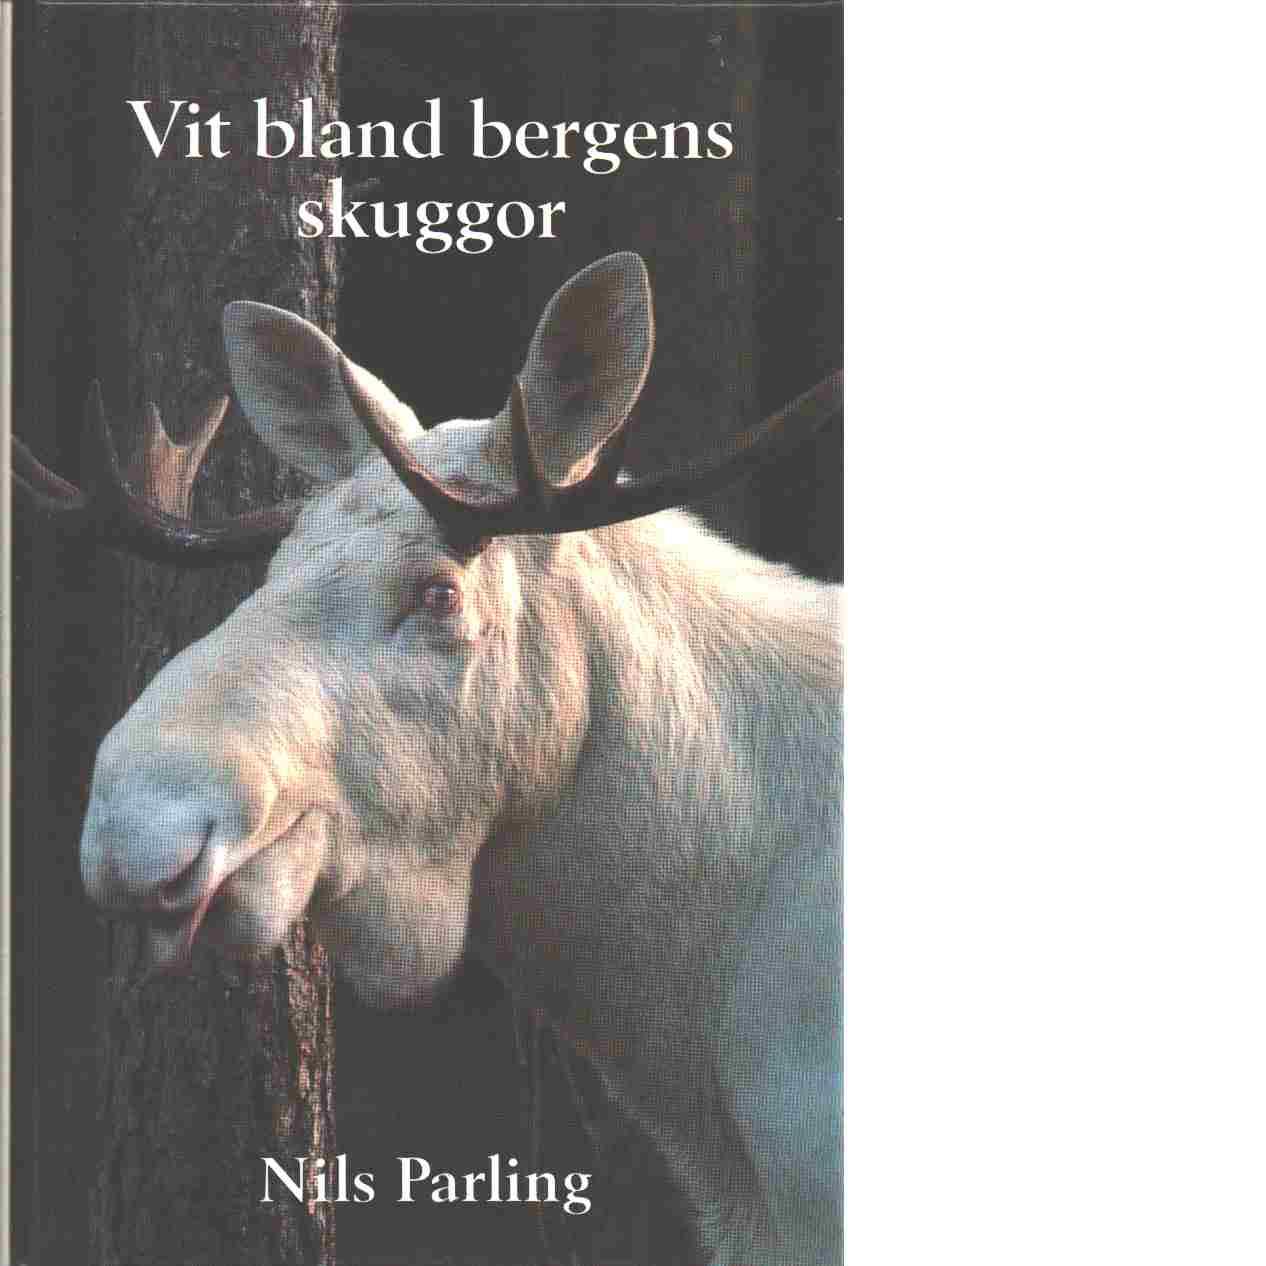 Vit bland bergens skuggor : sentida naturskildring - Parling, Nils